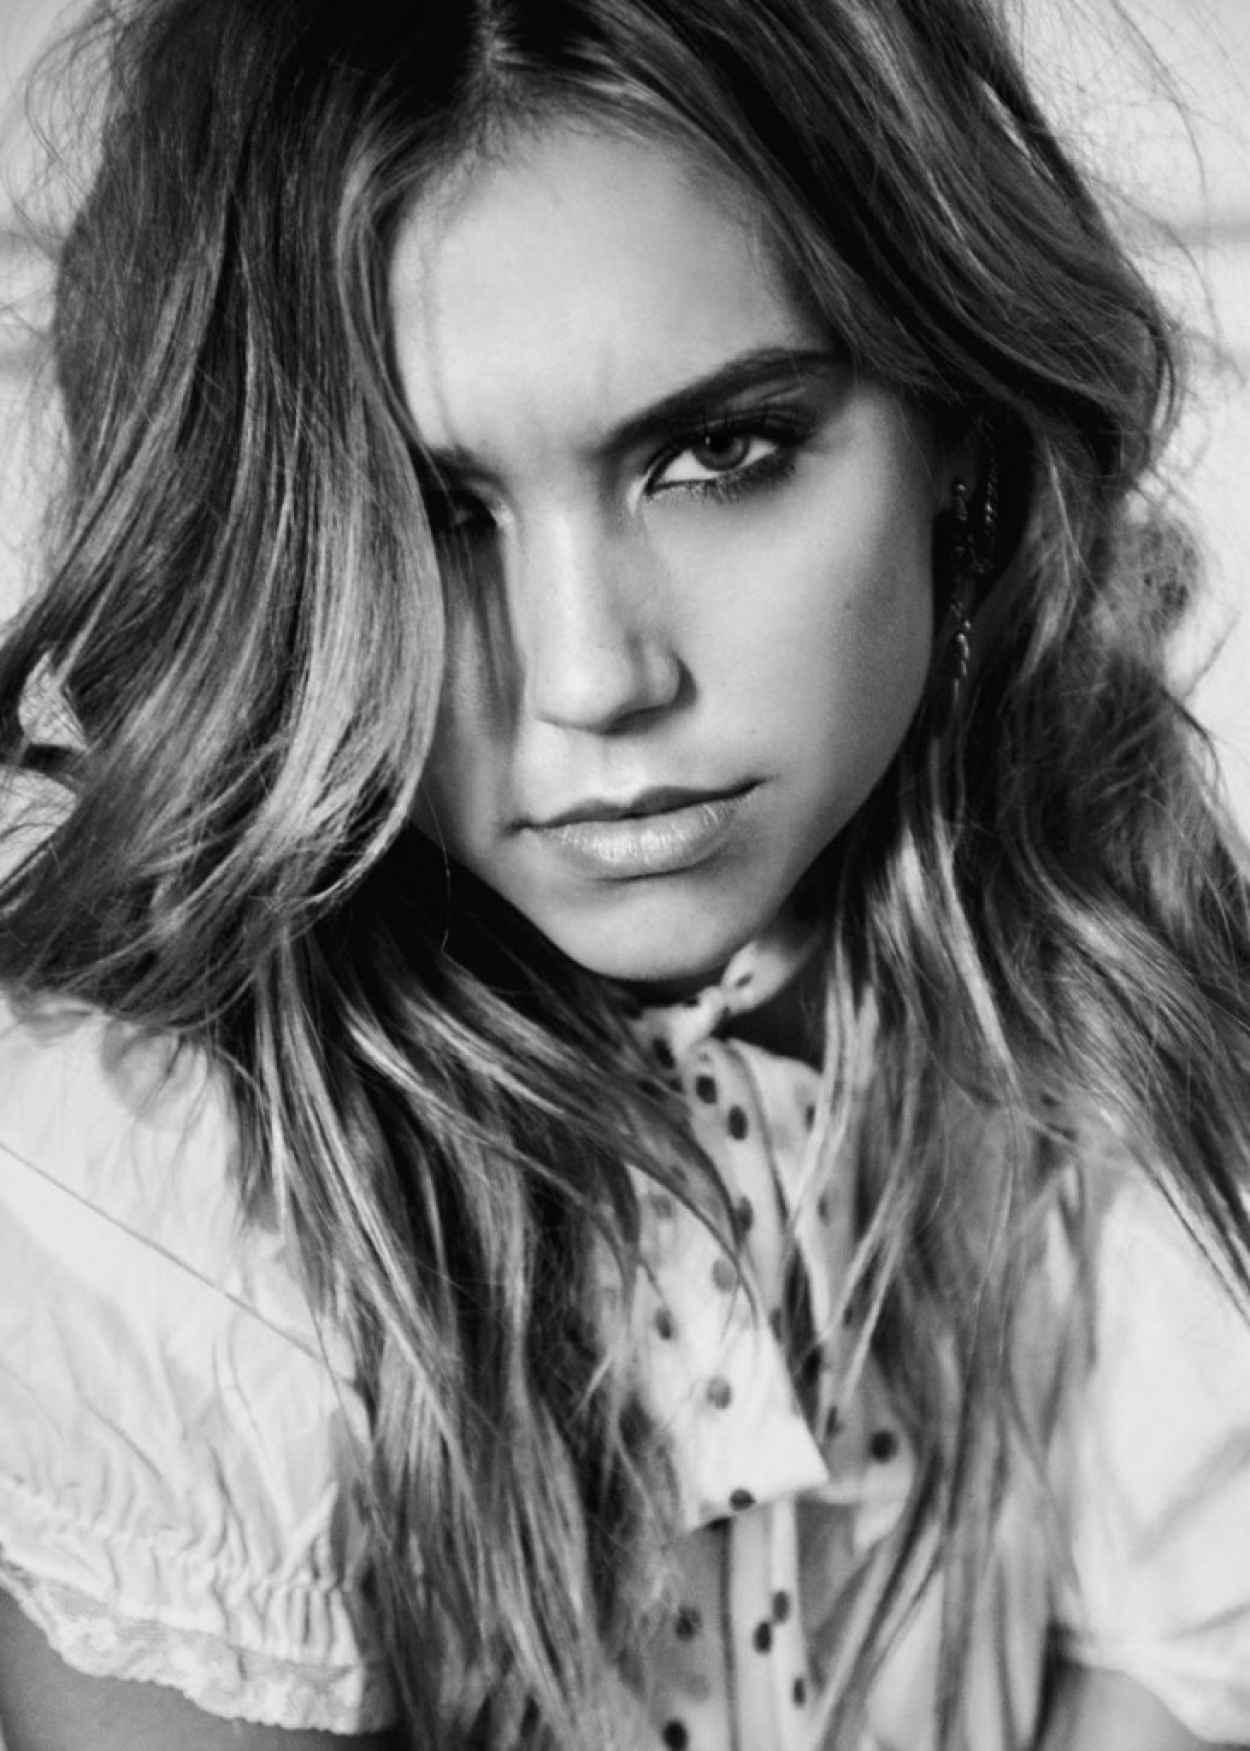 Alexis Ren - Photoshoot 2015-1